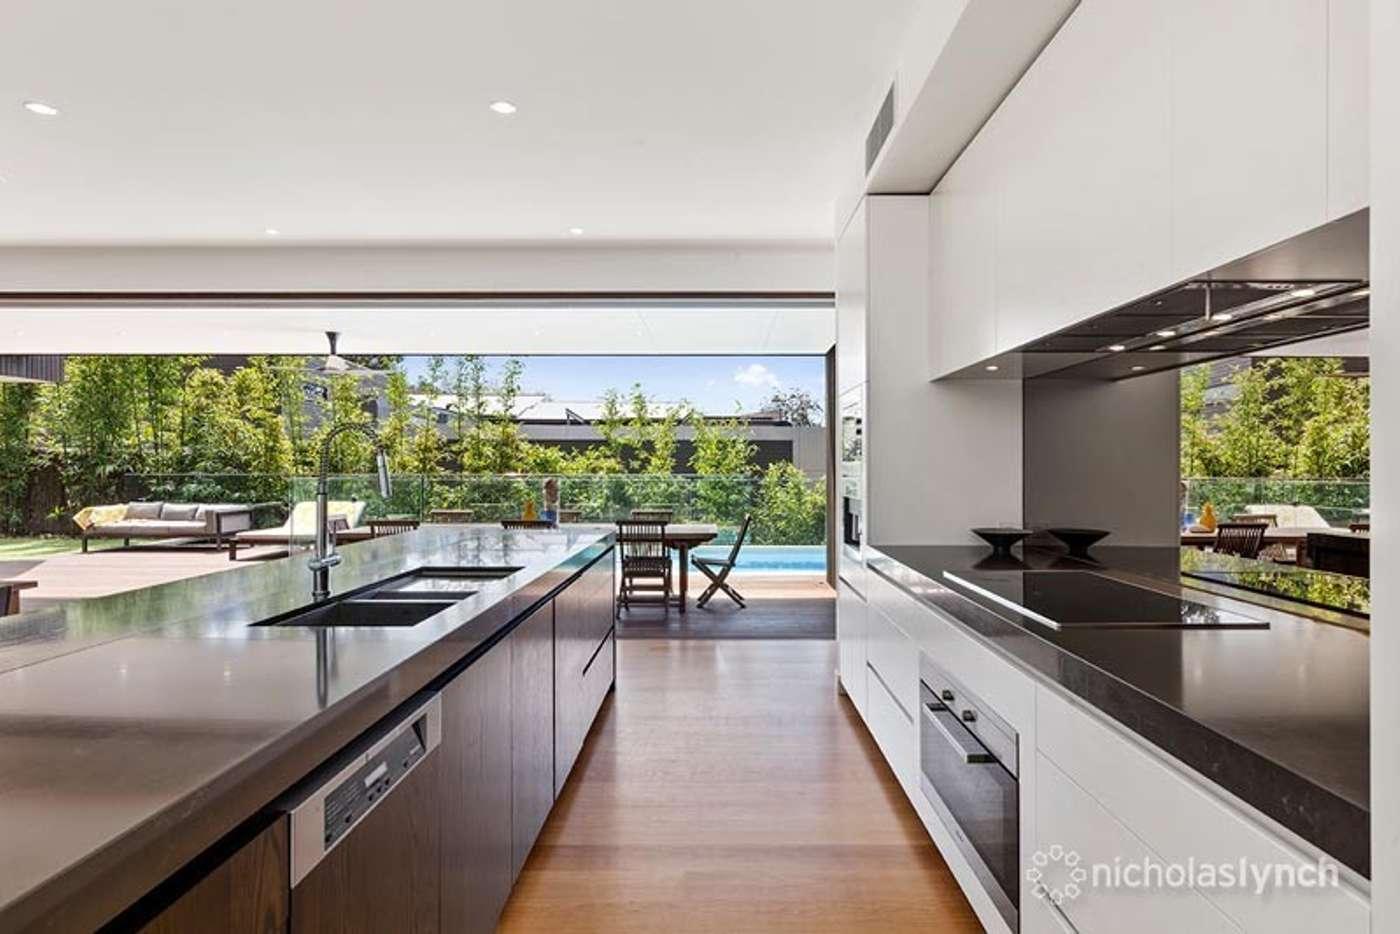 Sixth view of Homely house listing, 21 Prescott Avenue, Mount Martha VIC 3934